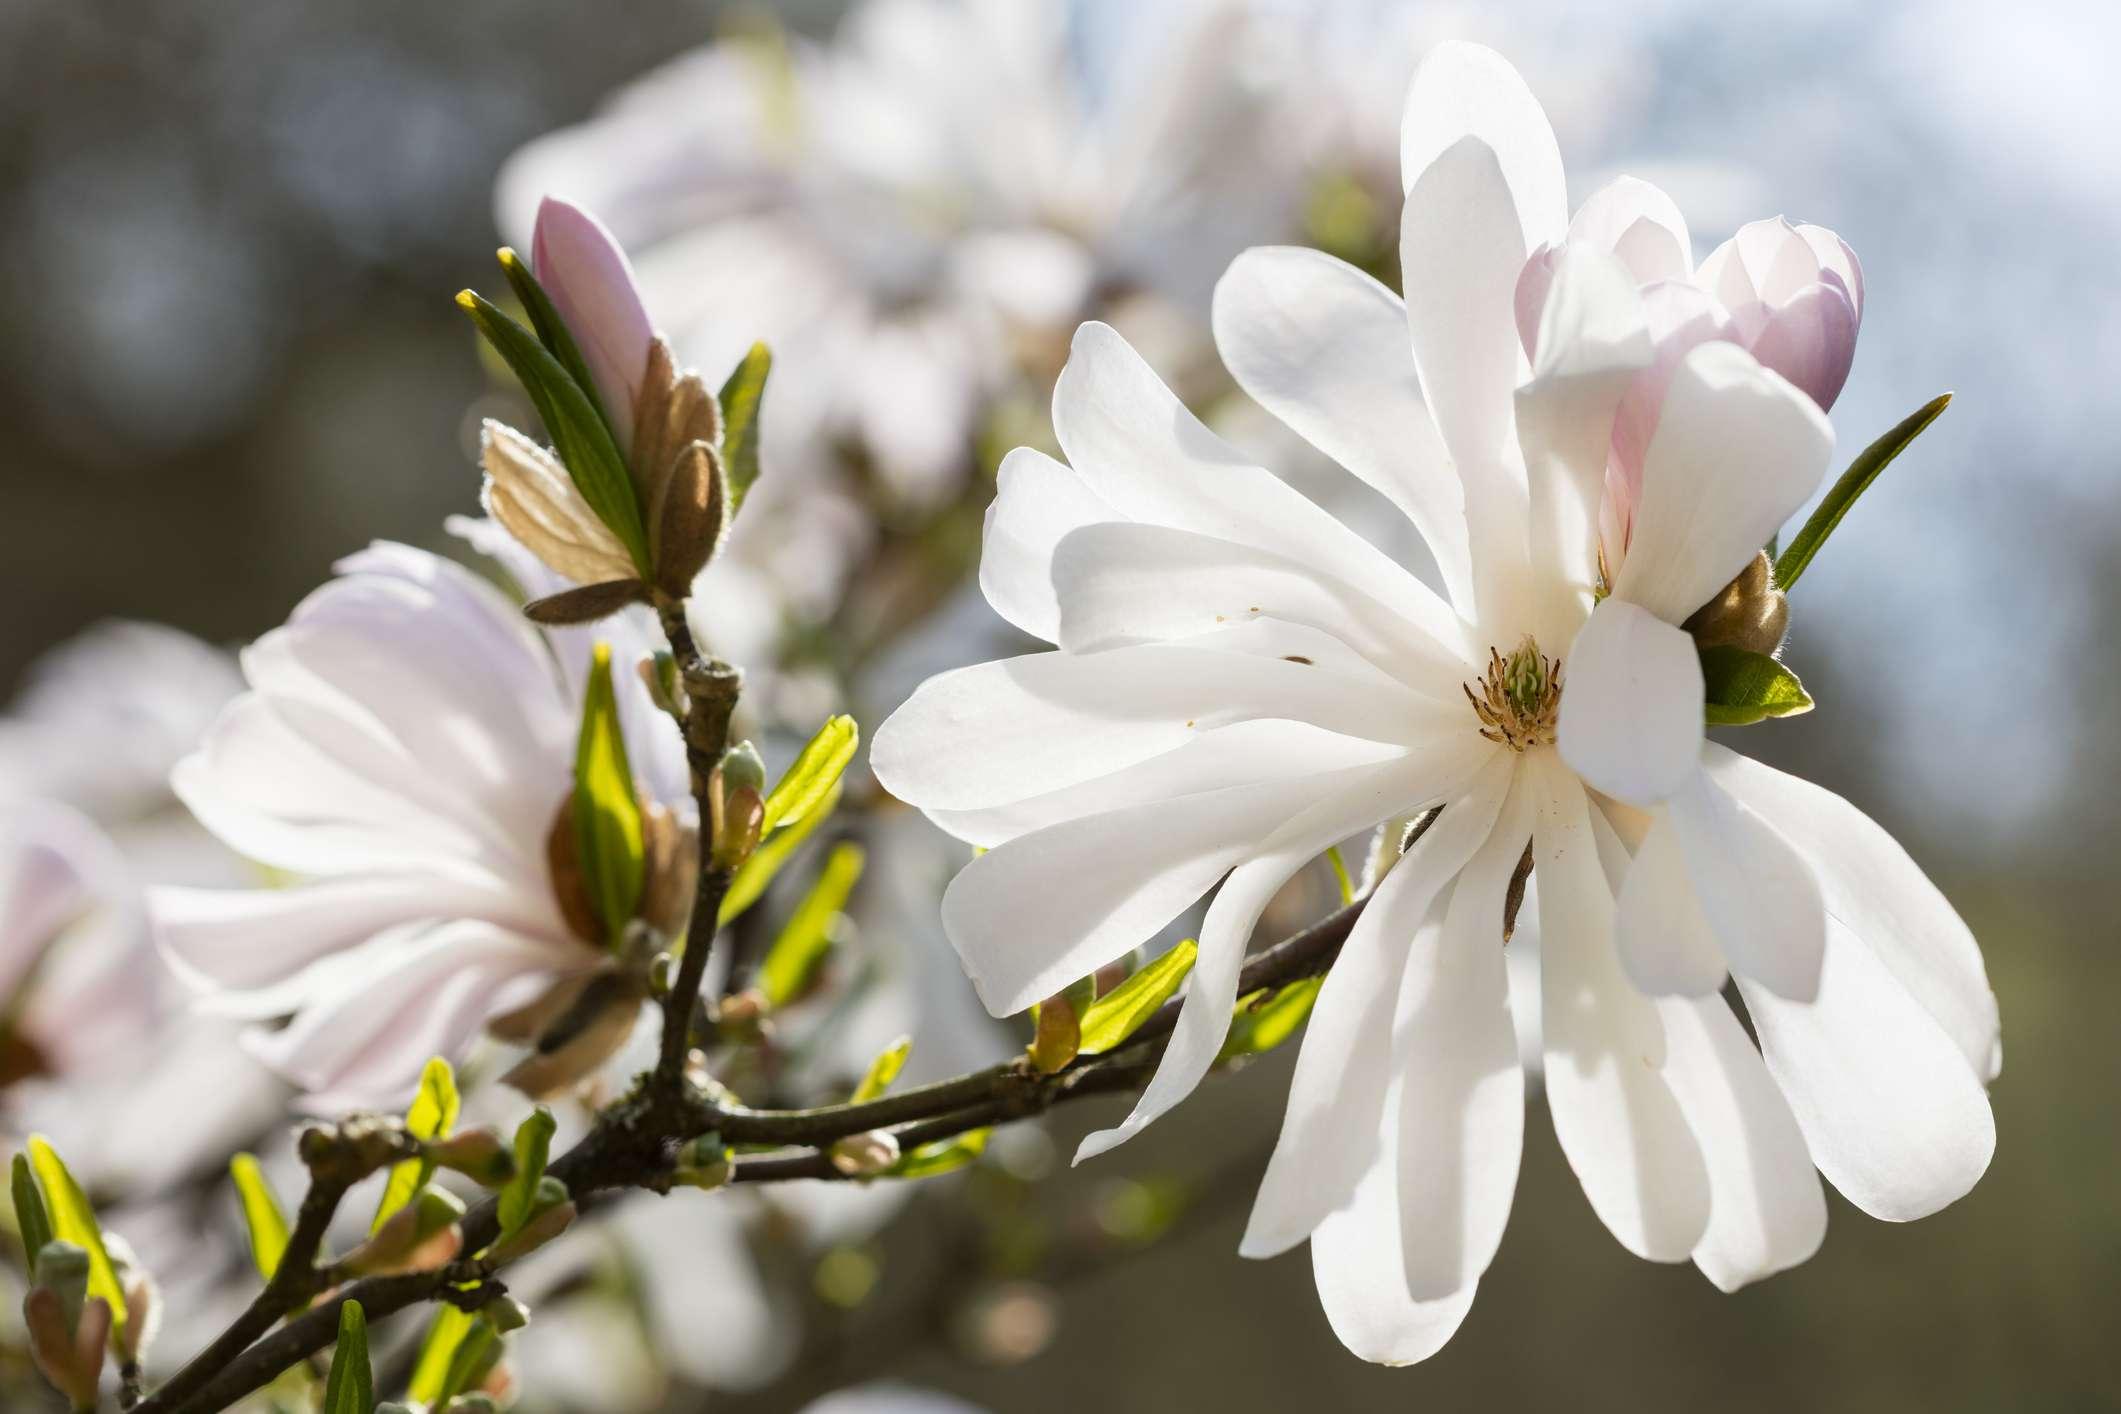 Blossom of Star Magnolia